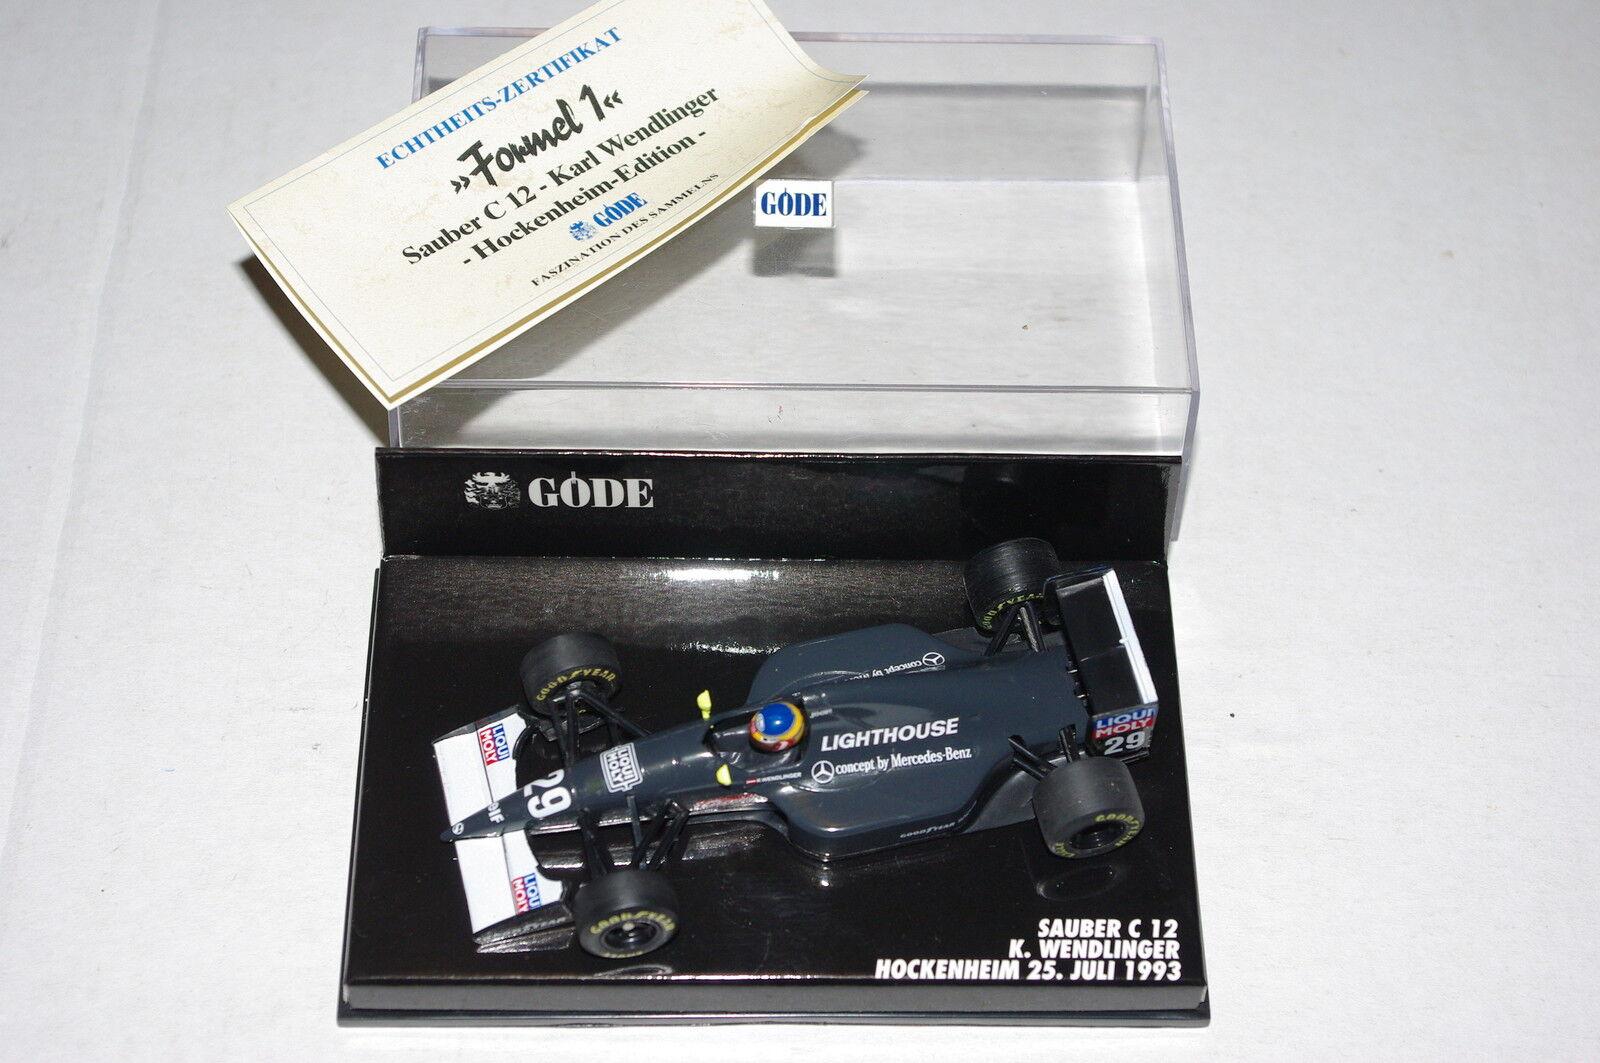 Minichamps F1 1 1 1 43 SAUBER C12 Karl WENDLINGER HOCKENHEIM 1993 GODE EDITION 066